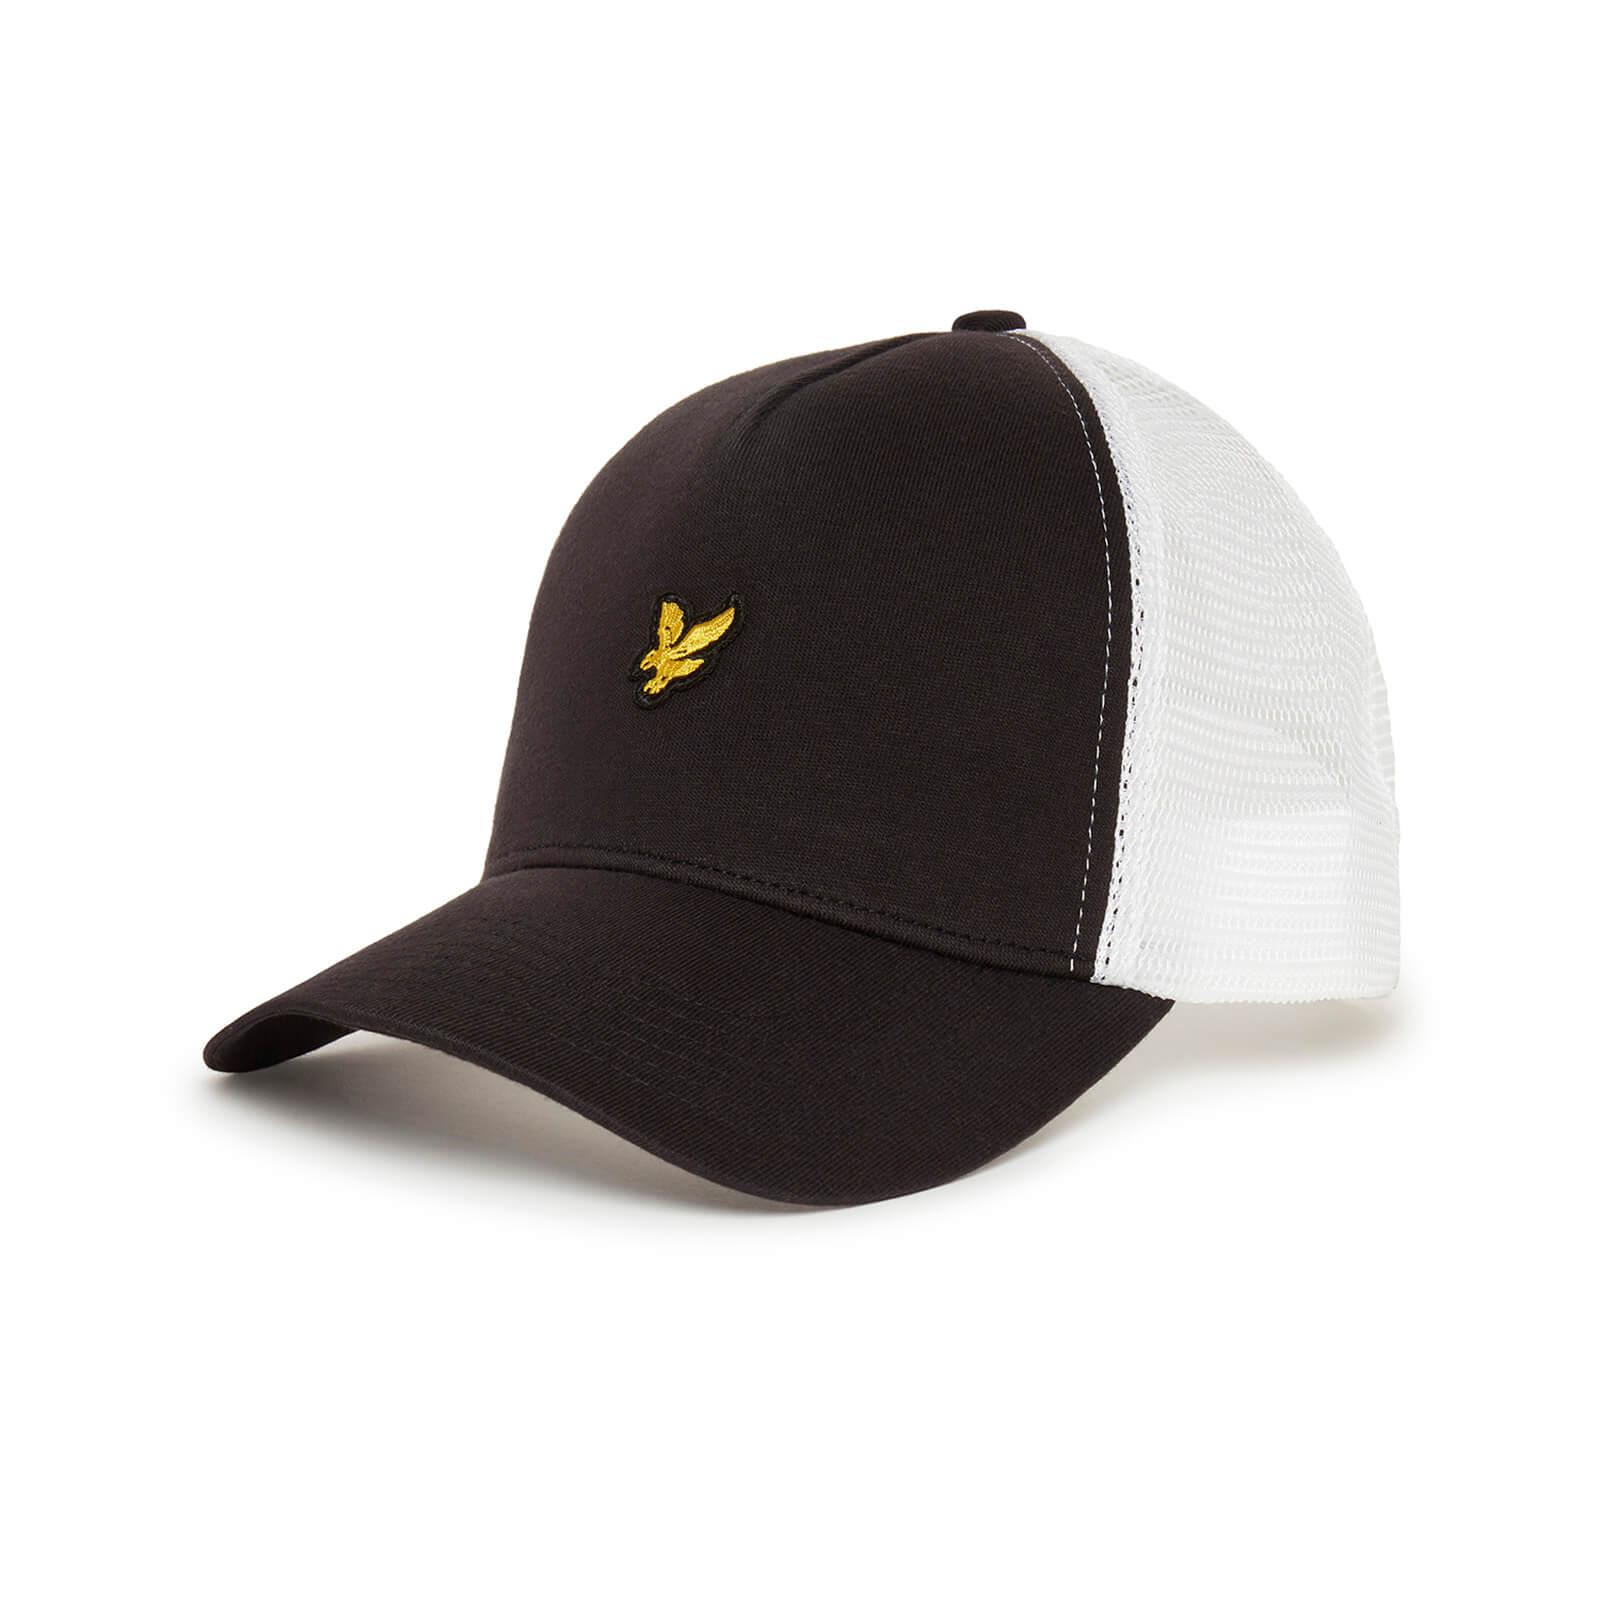 Trucker Cap - True Black/White Mesh - One Size